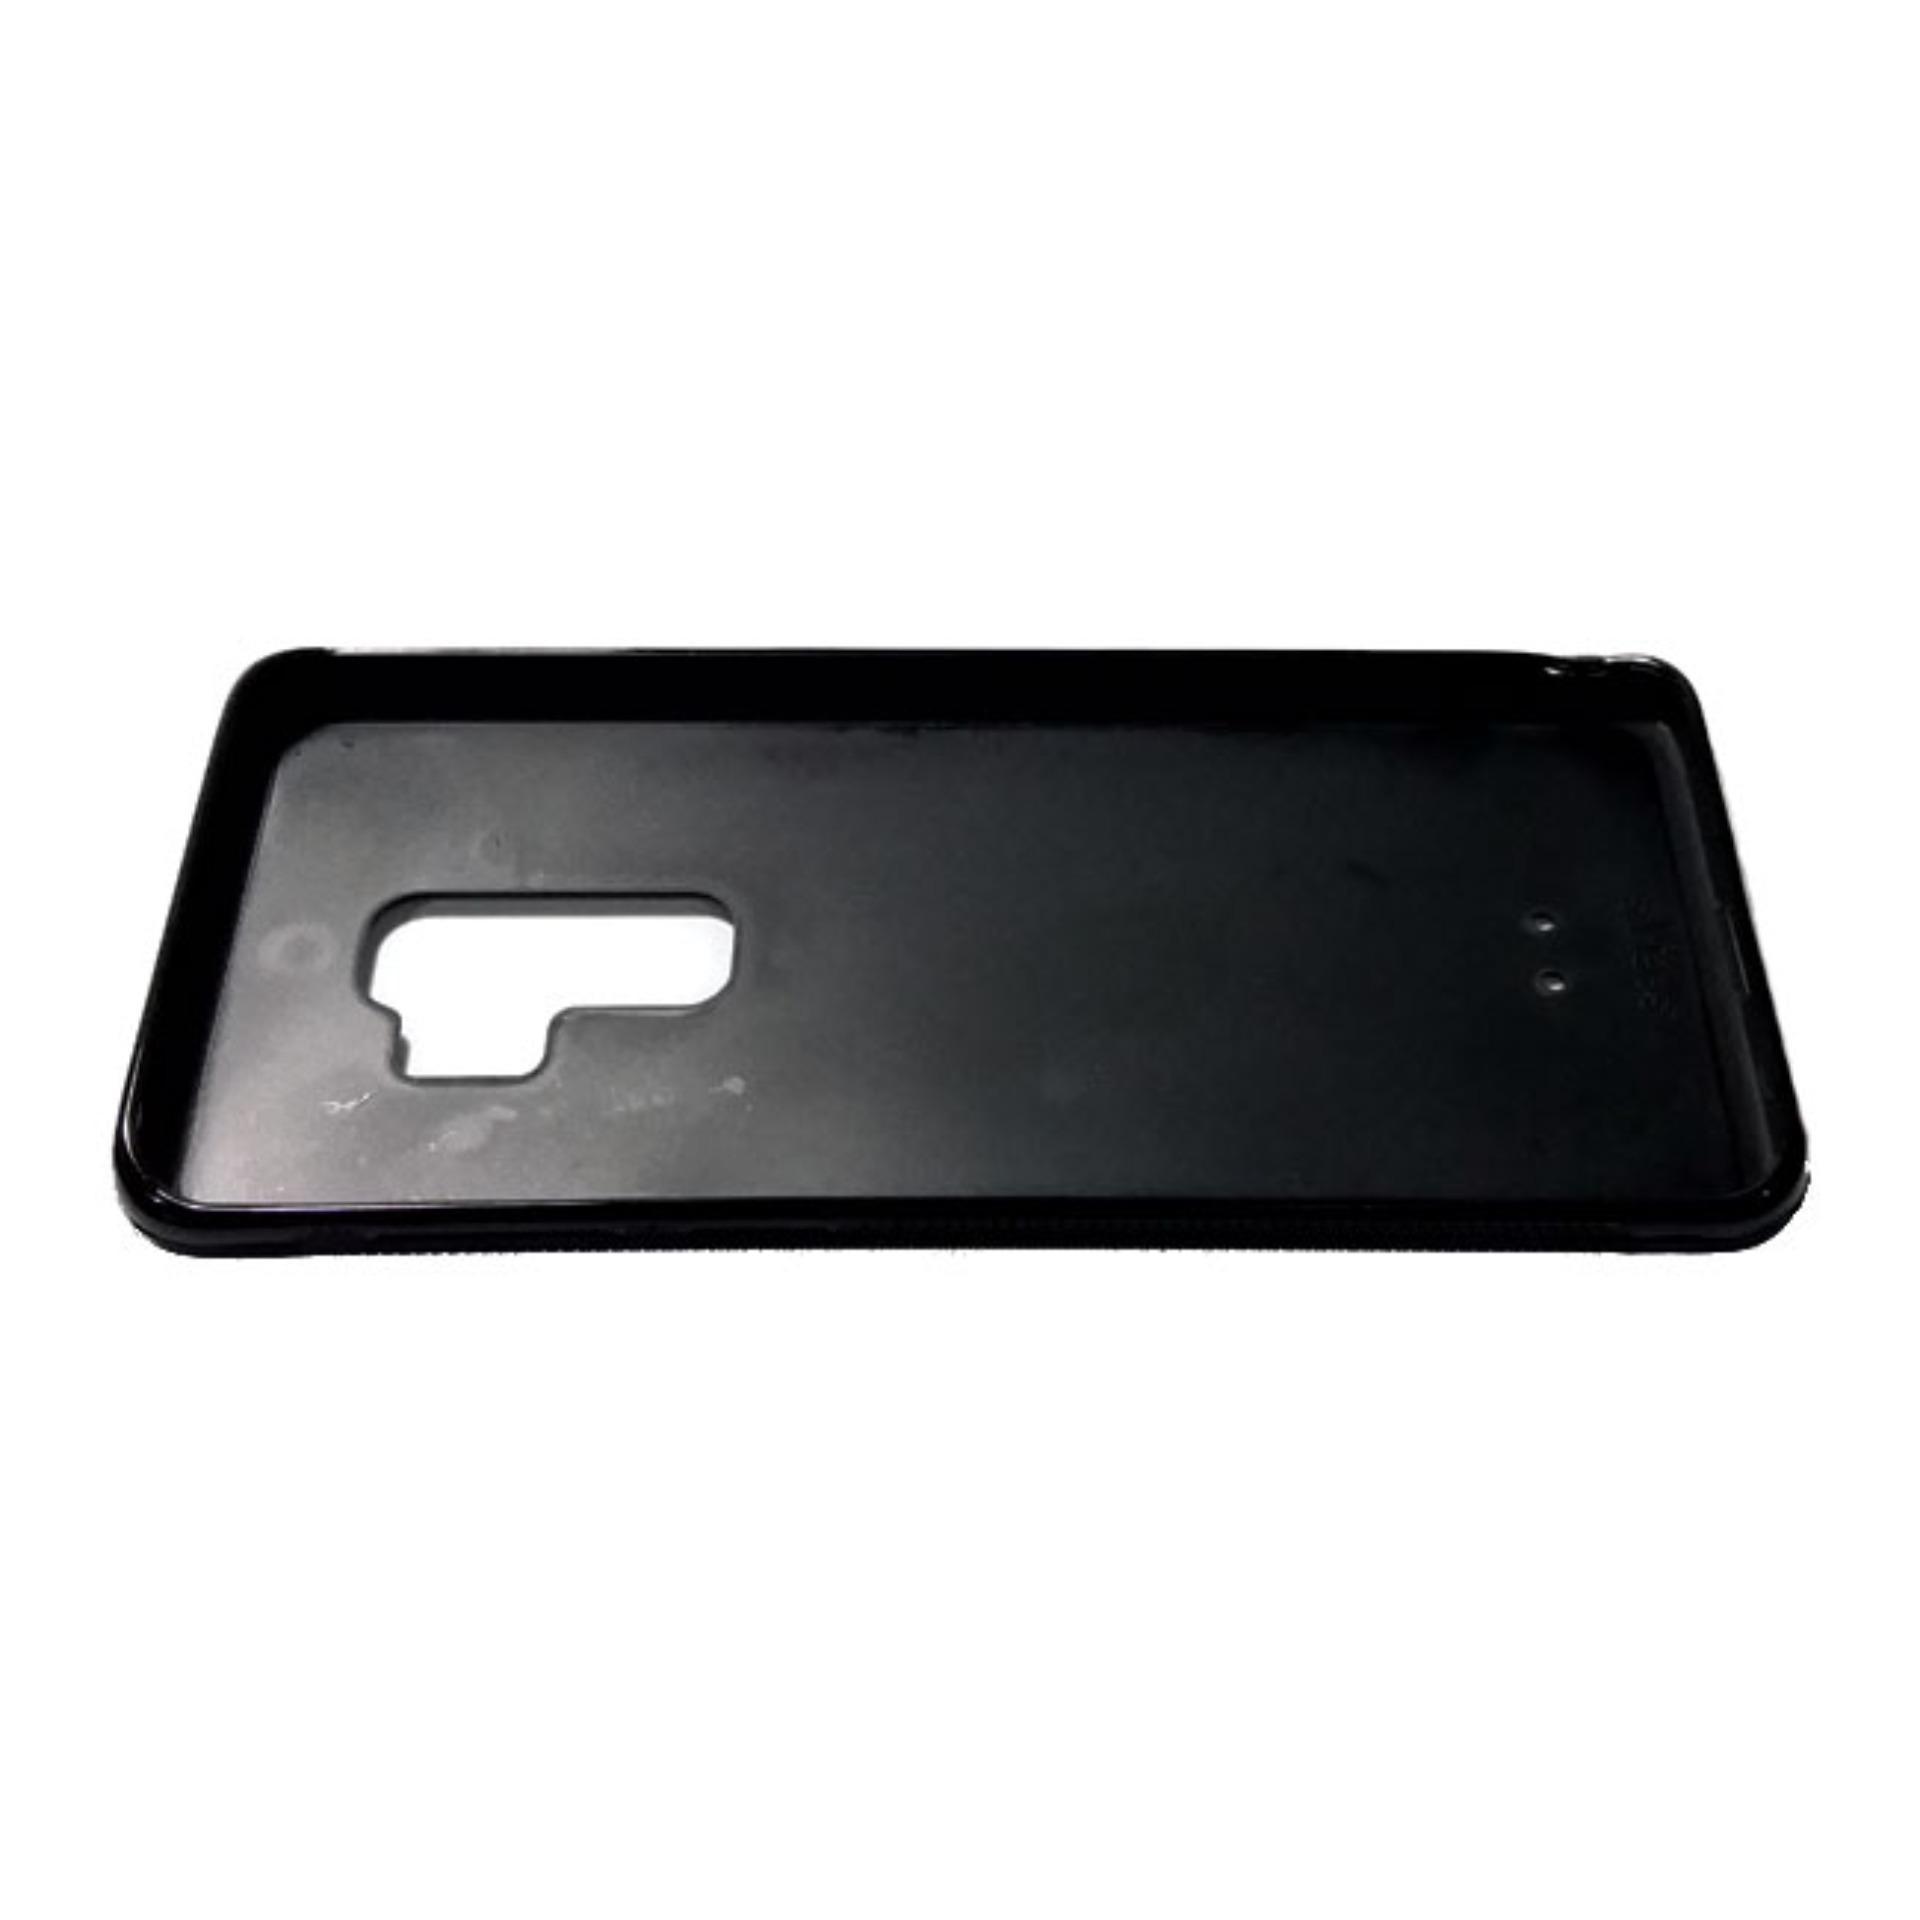 HEAVENCASE Case Casing Samsung Galaxy S9 PLUS Case Softcase Hitam Motif Unik Tuxedo .